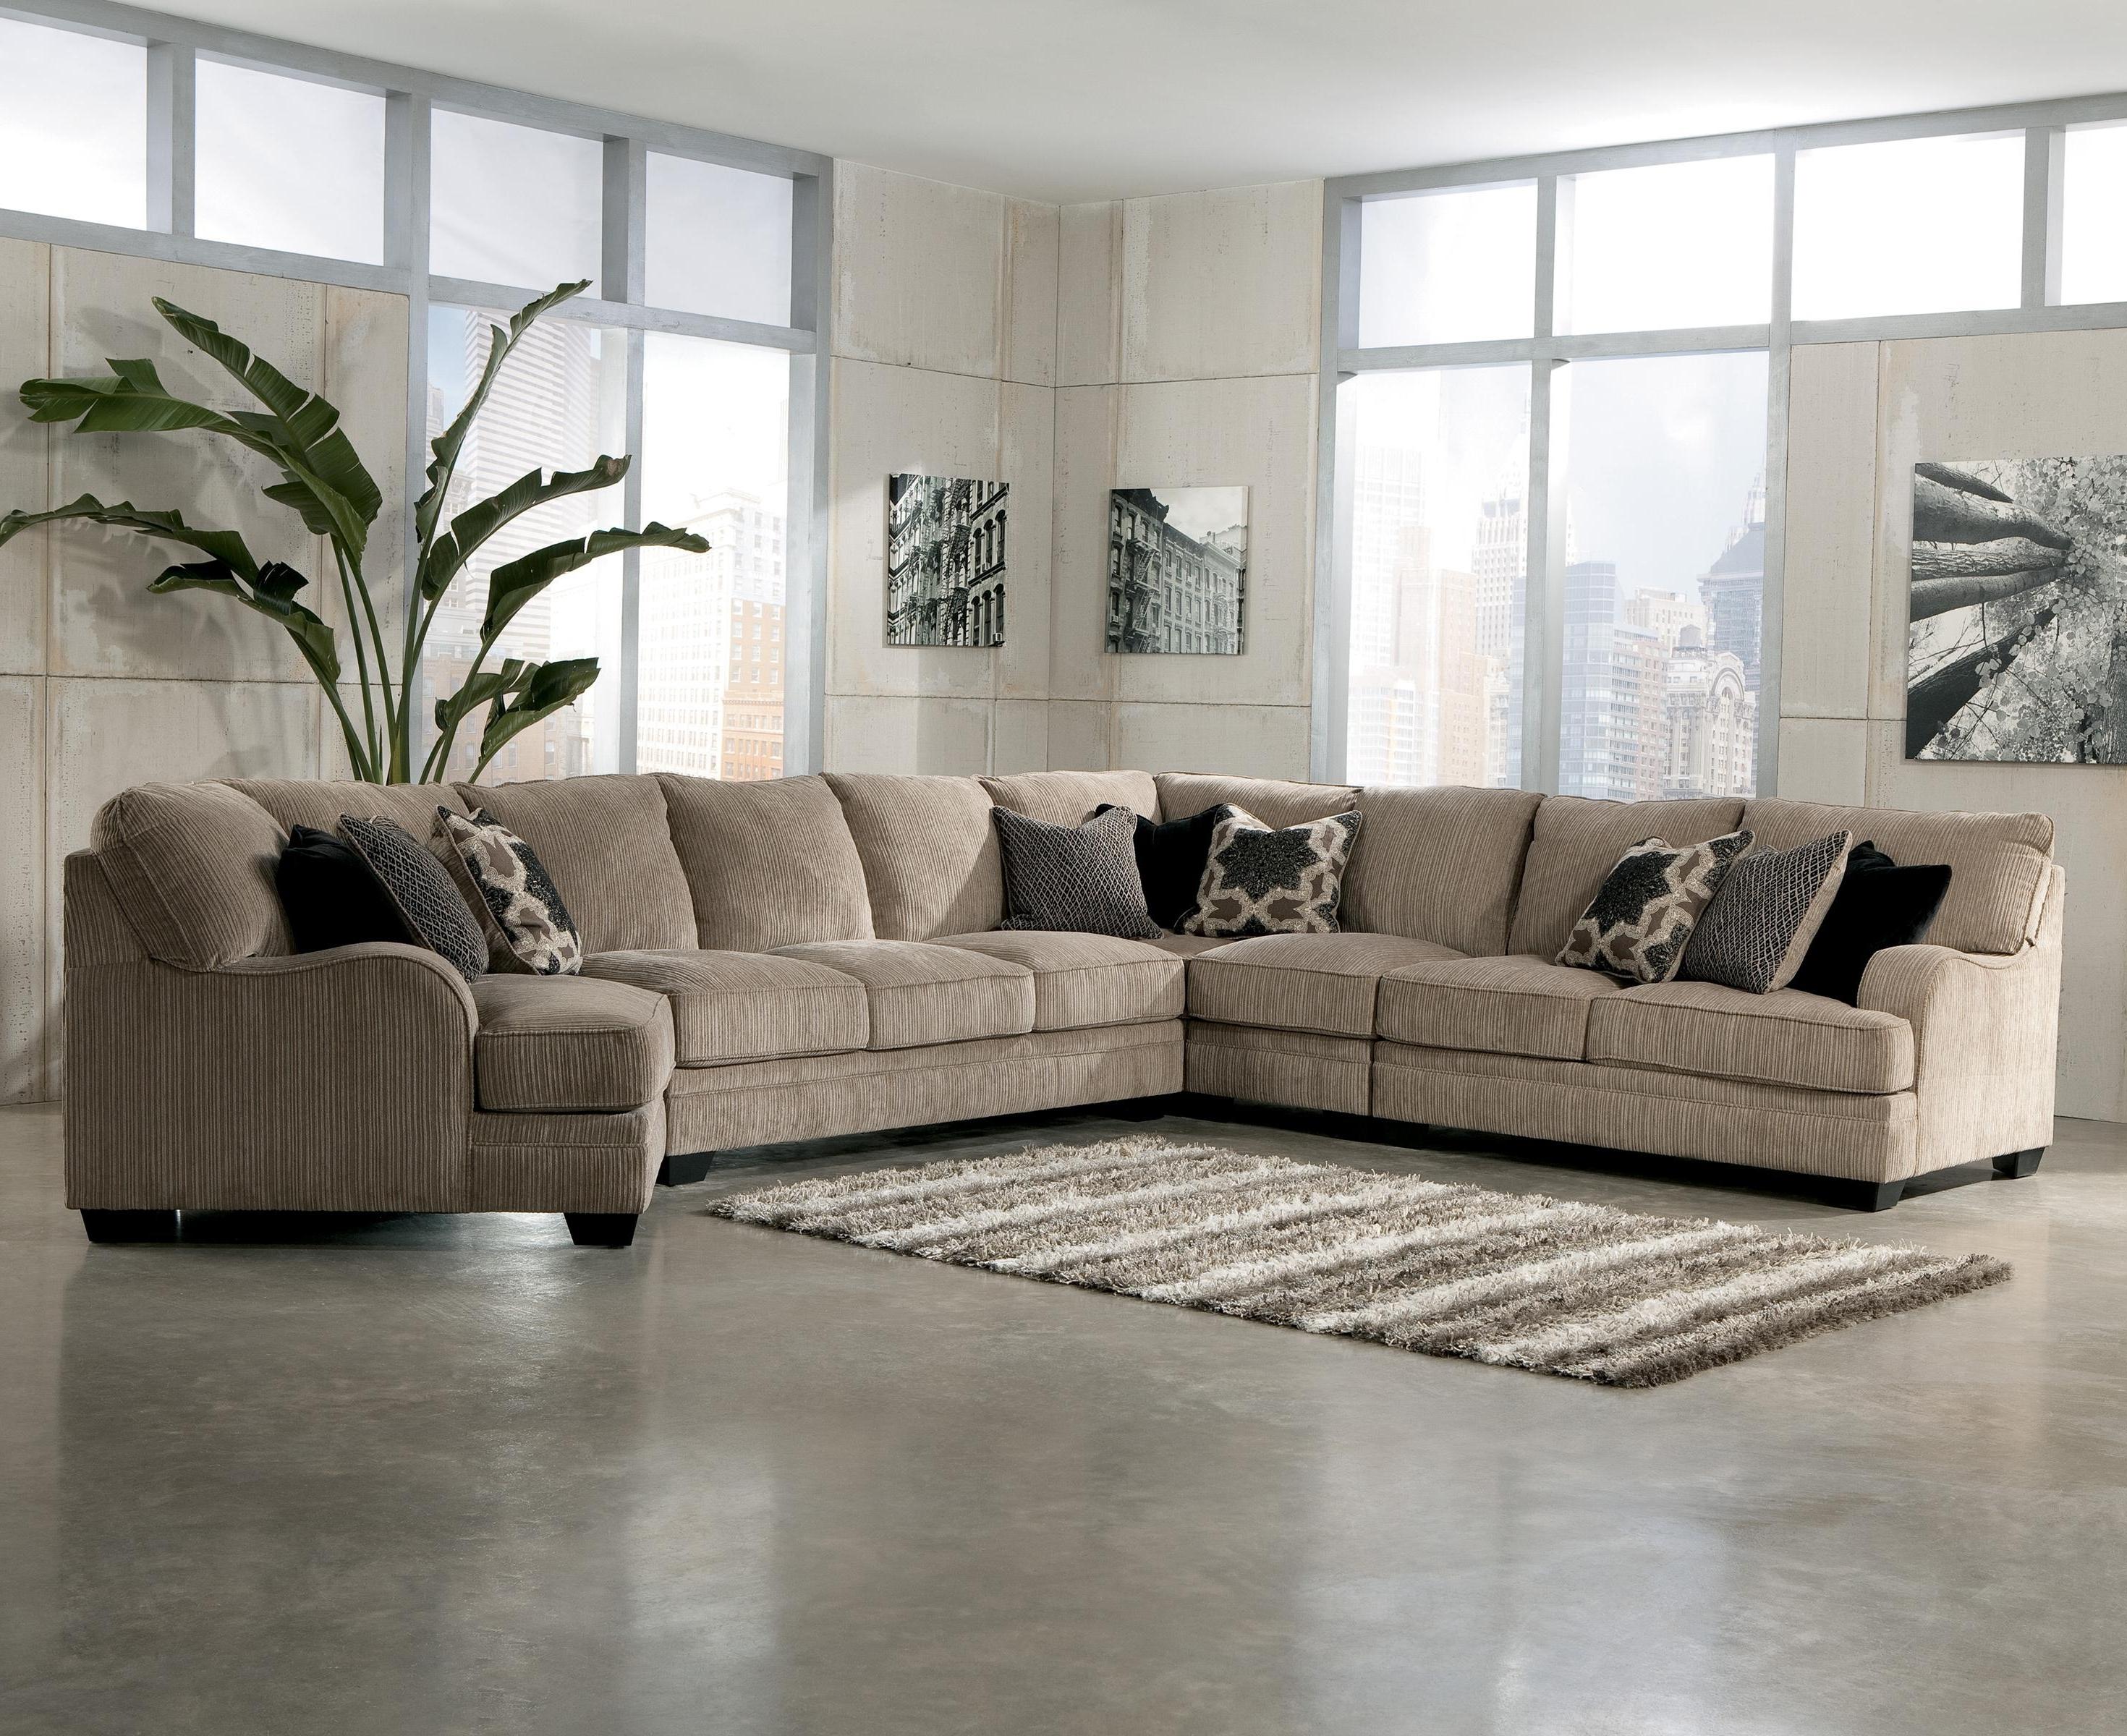 Signature Designashley Katisha – Platinum 5 Piece Sectional Regarding 2019 Killeen Tx Sectional Sofas (View 10 of 20)